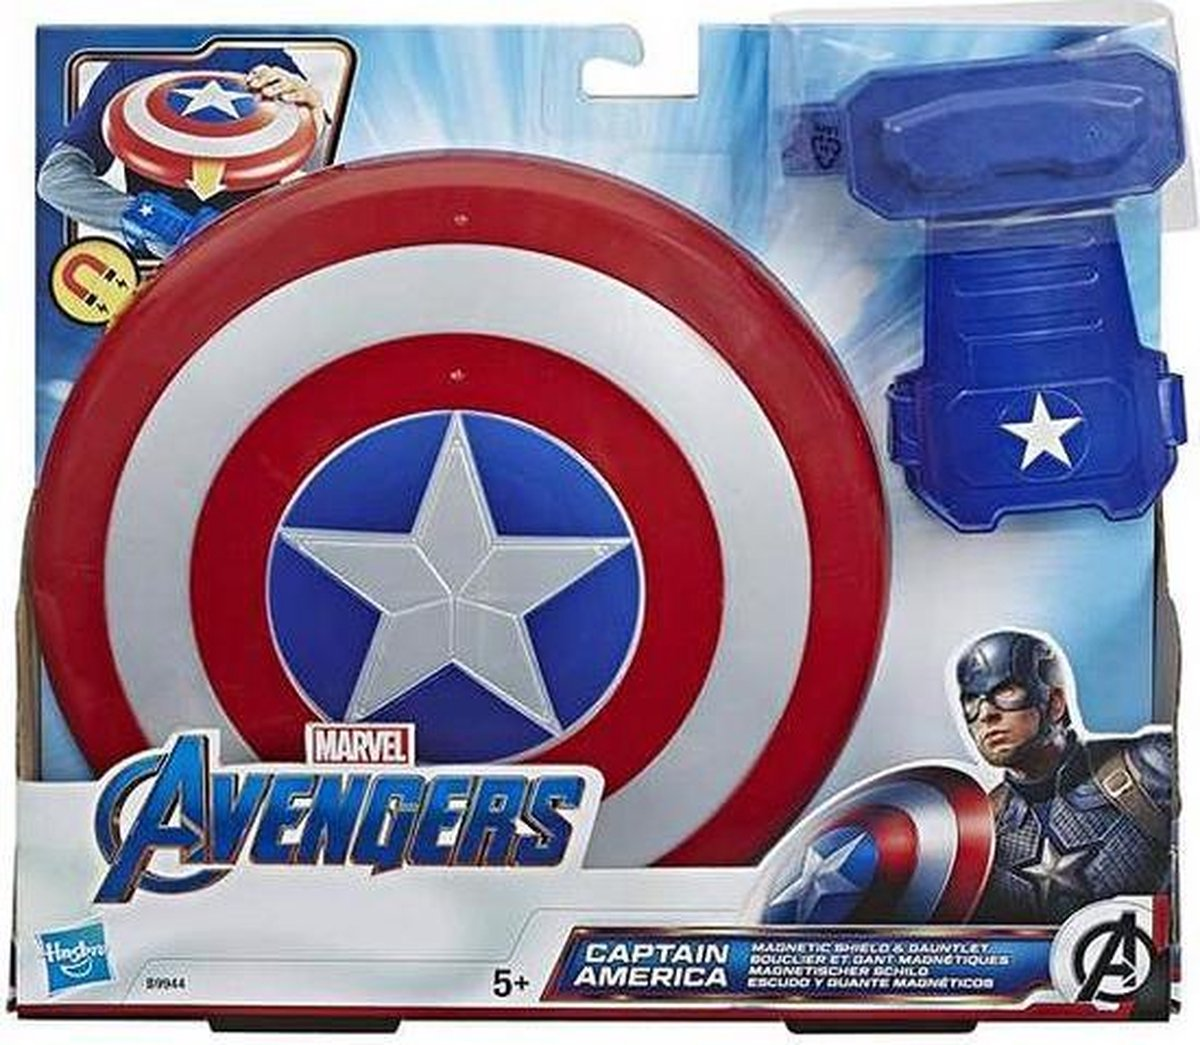 Avengers Captain America Magnetisch Schild Hasbro